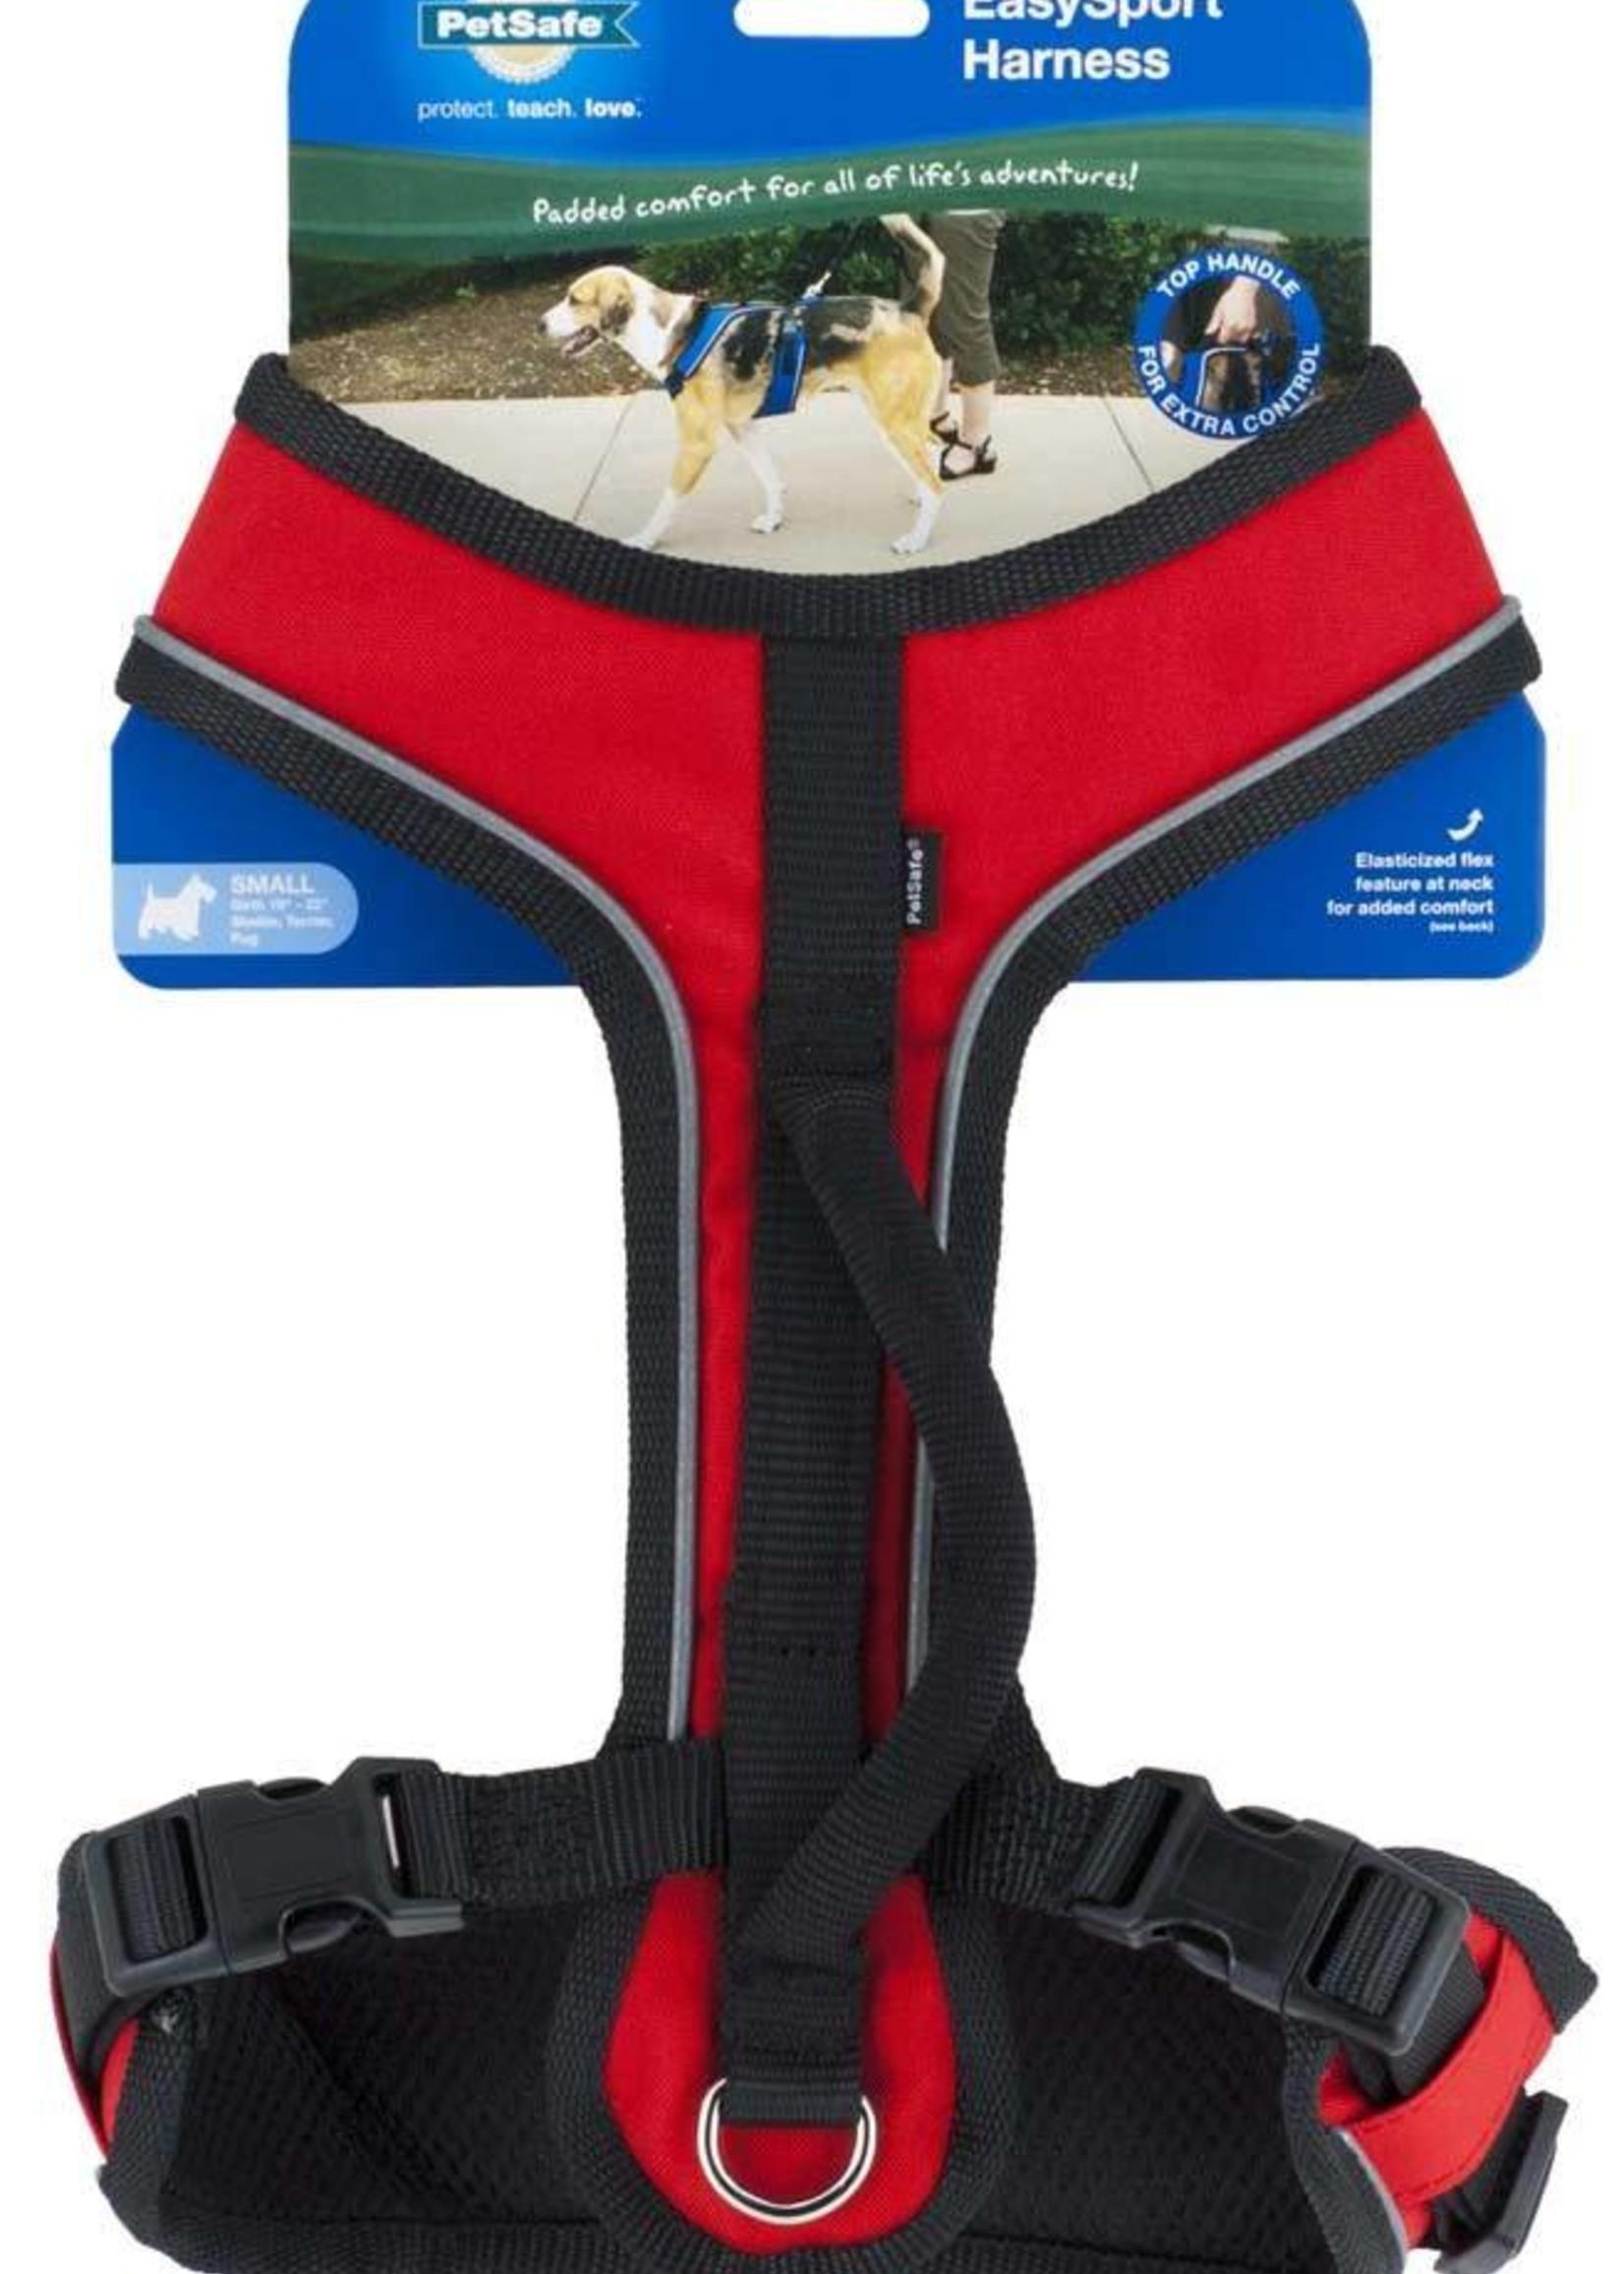 PetSafe Petsafe EasySport Harness Small - Red